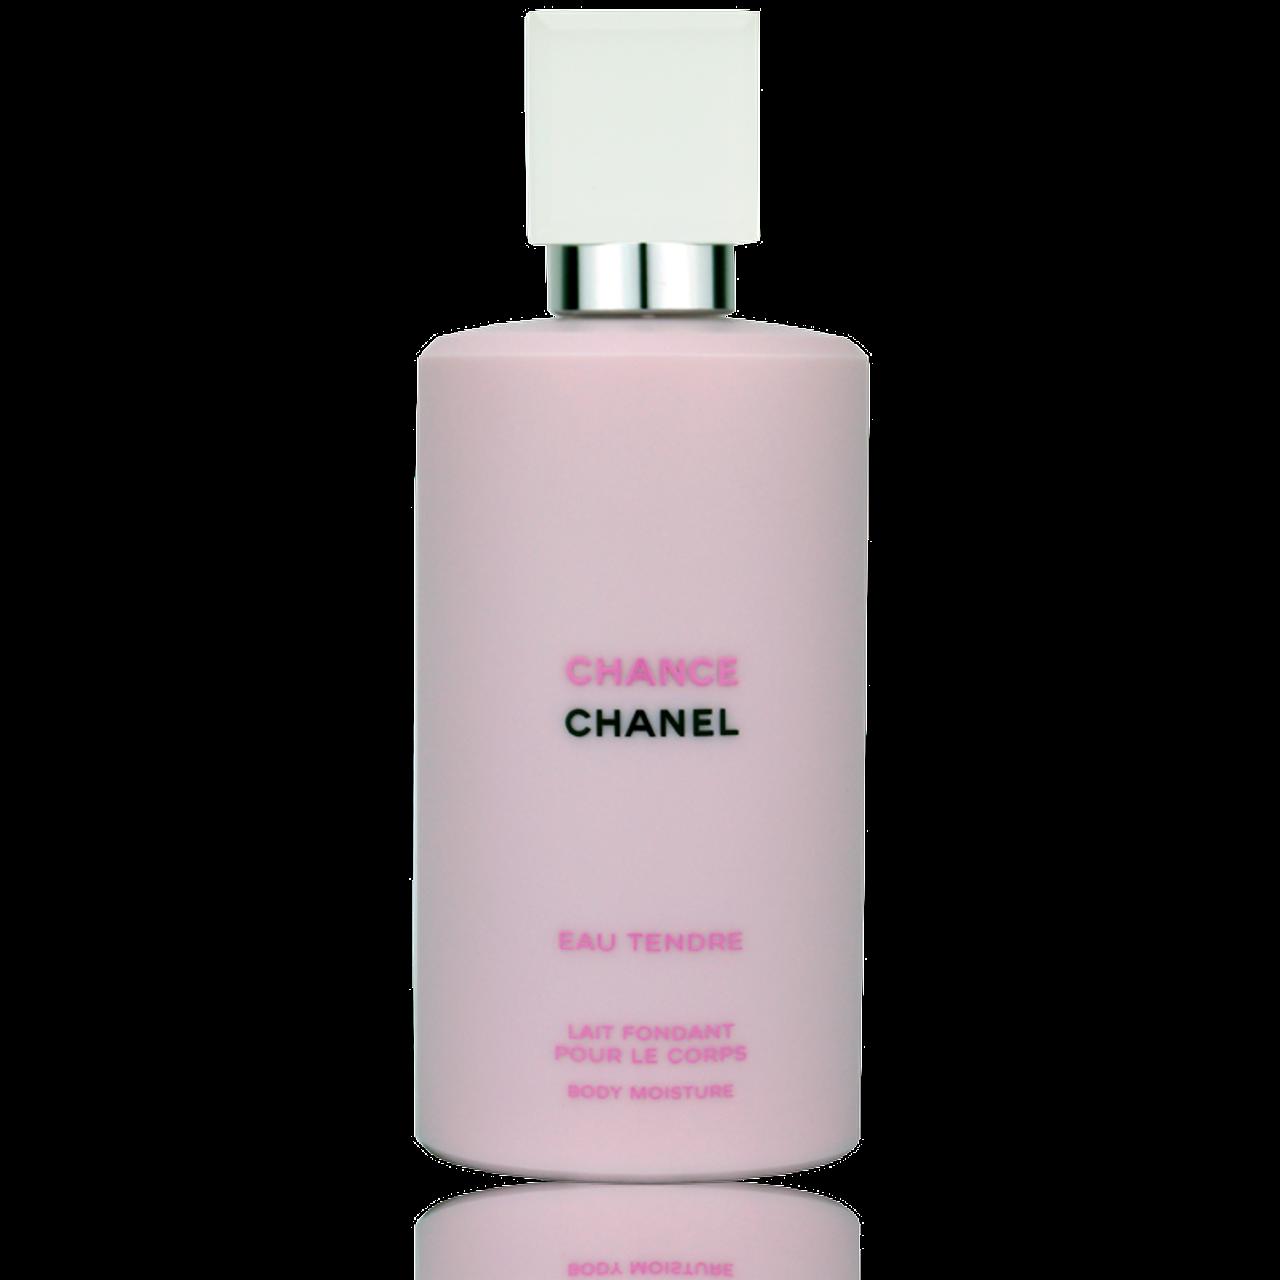 Chanel Chance Eau Tendre Body Lotion 200ml